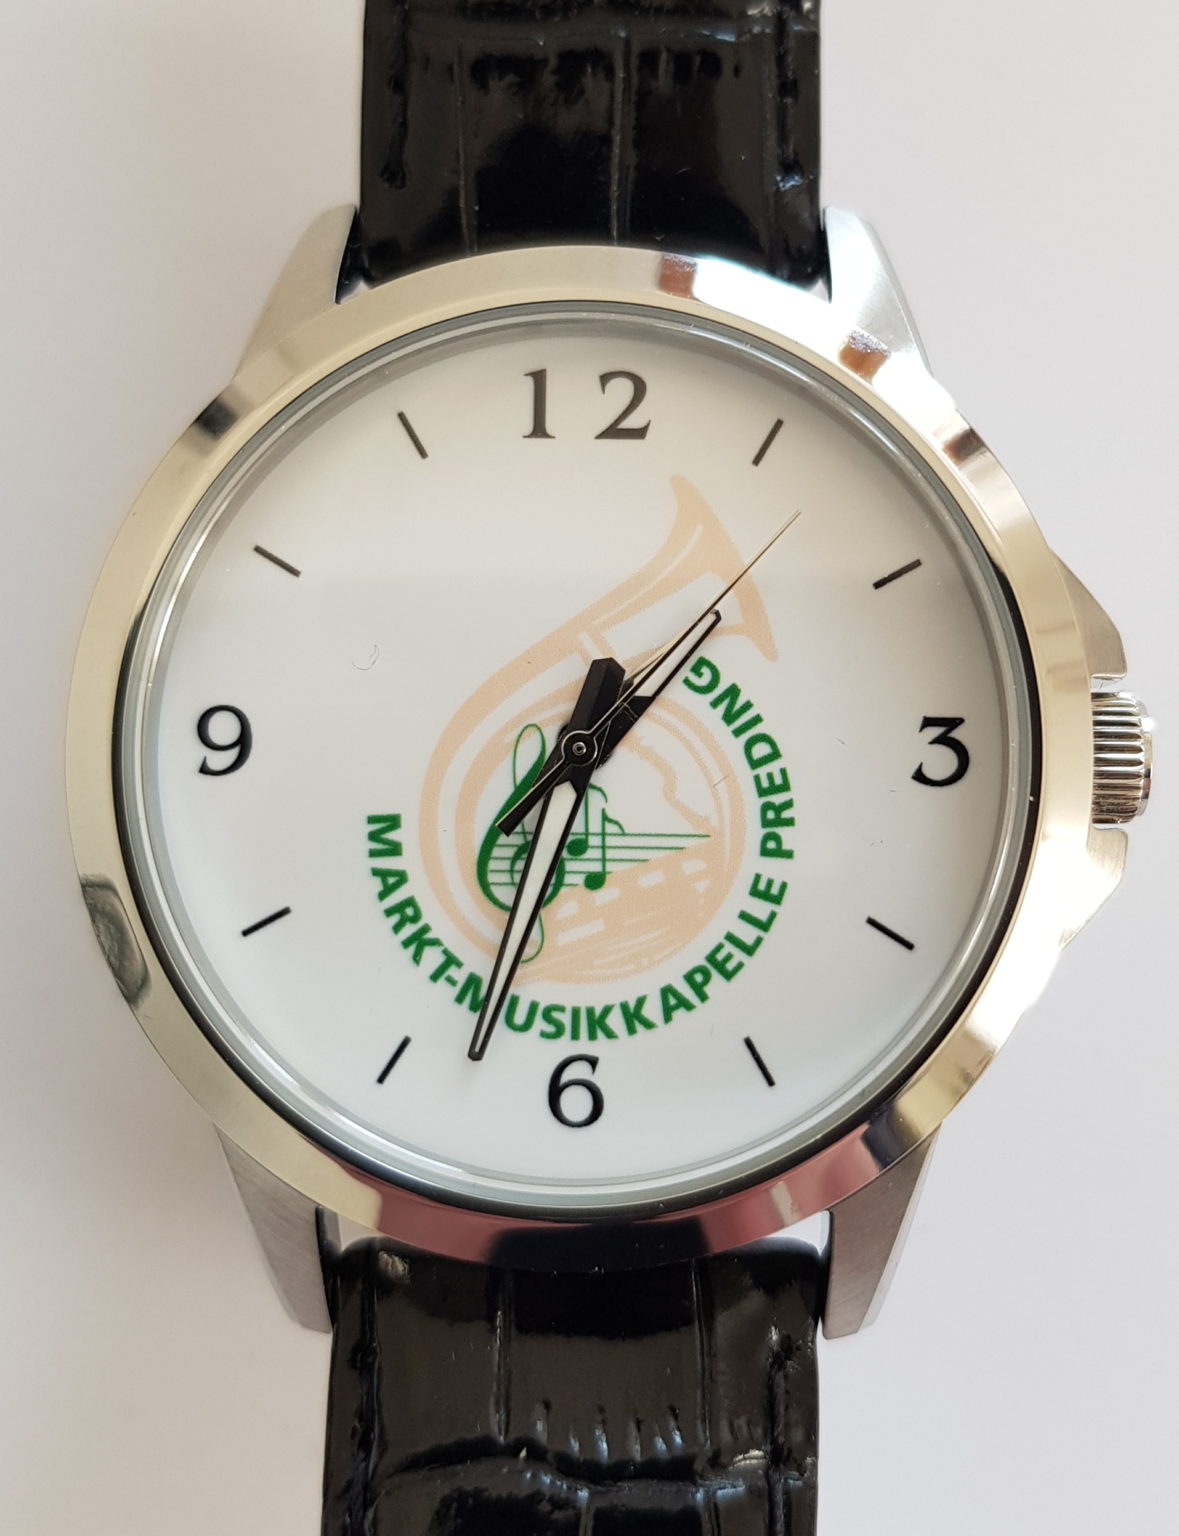 Uhr MMK-Preding